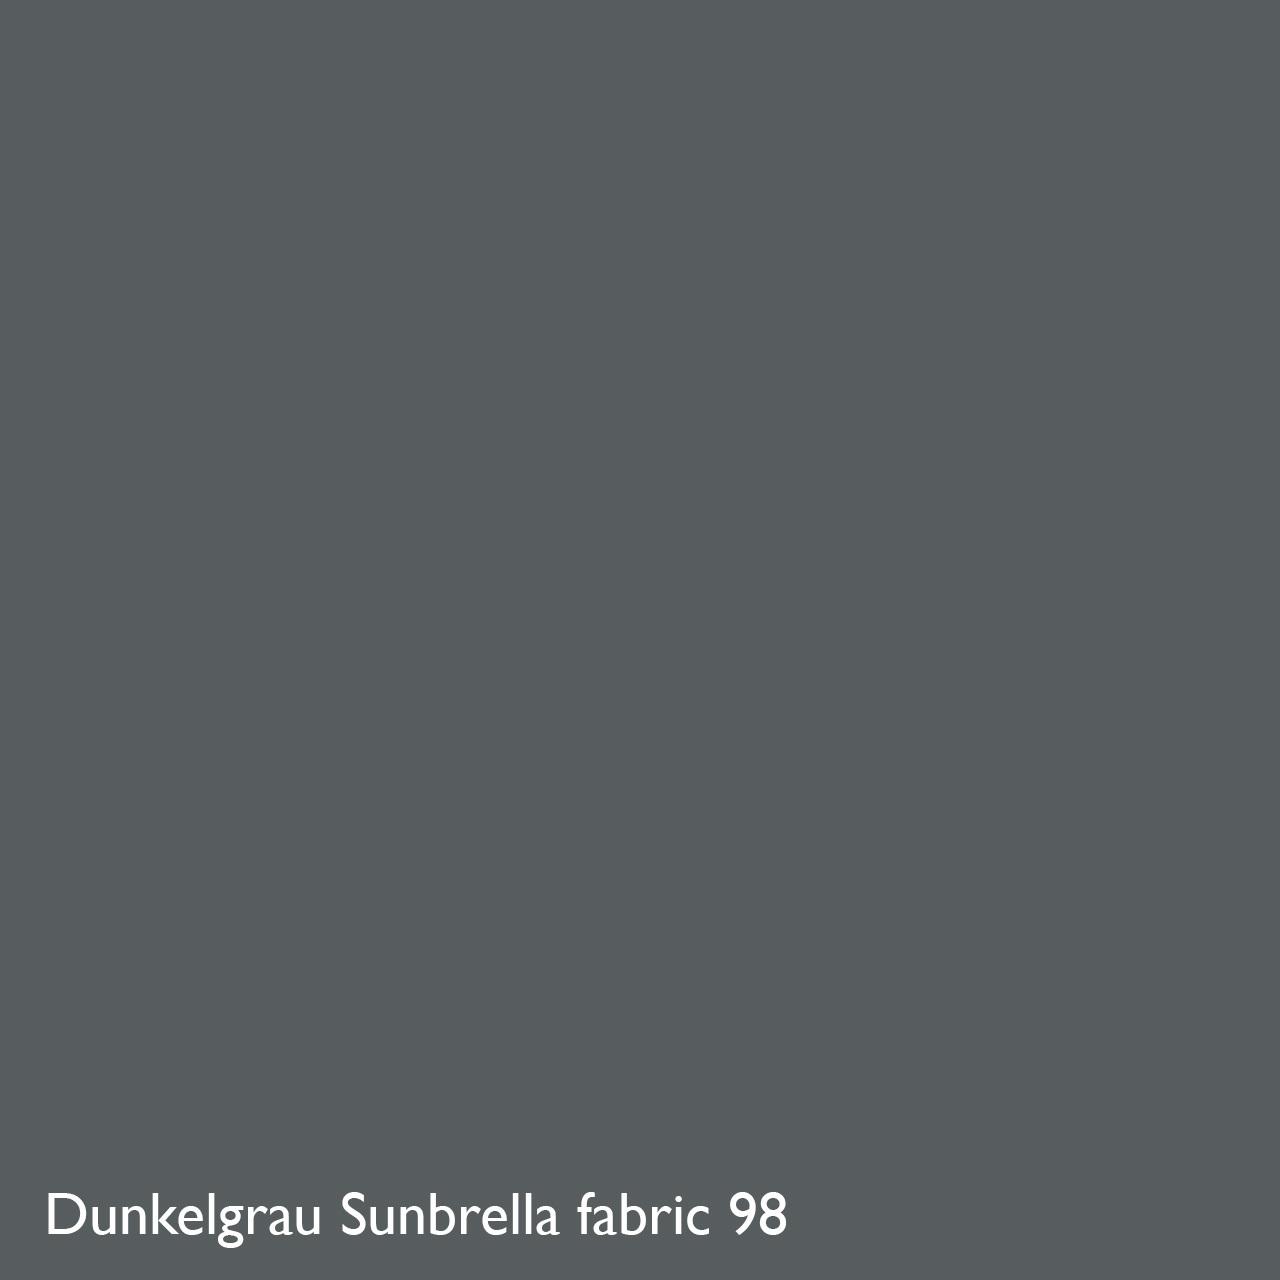 Houe Farbkachel Dunkelgrau 98